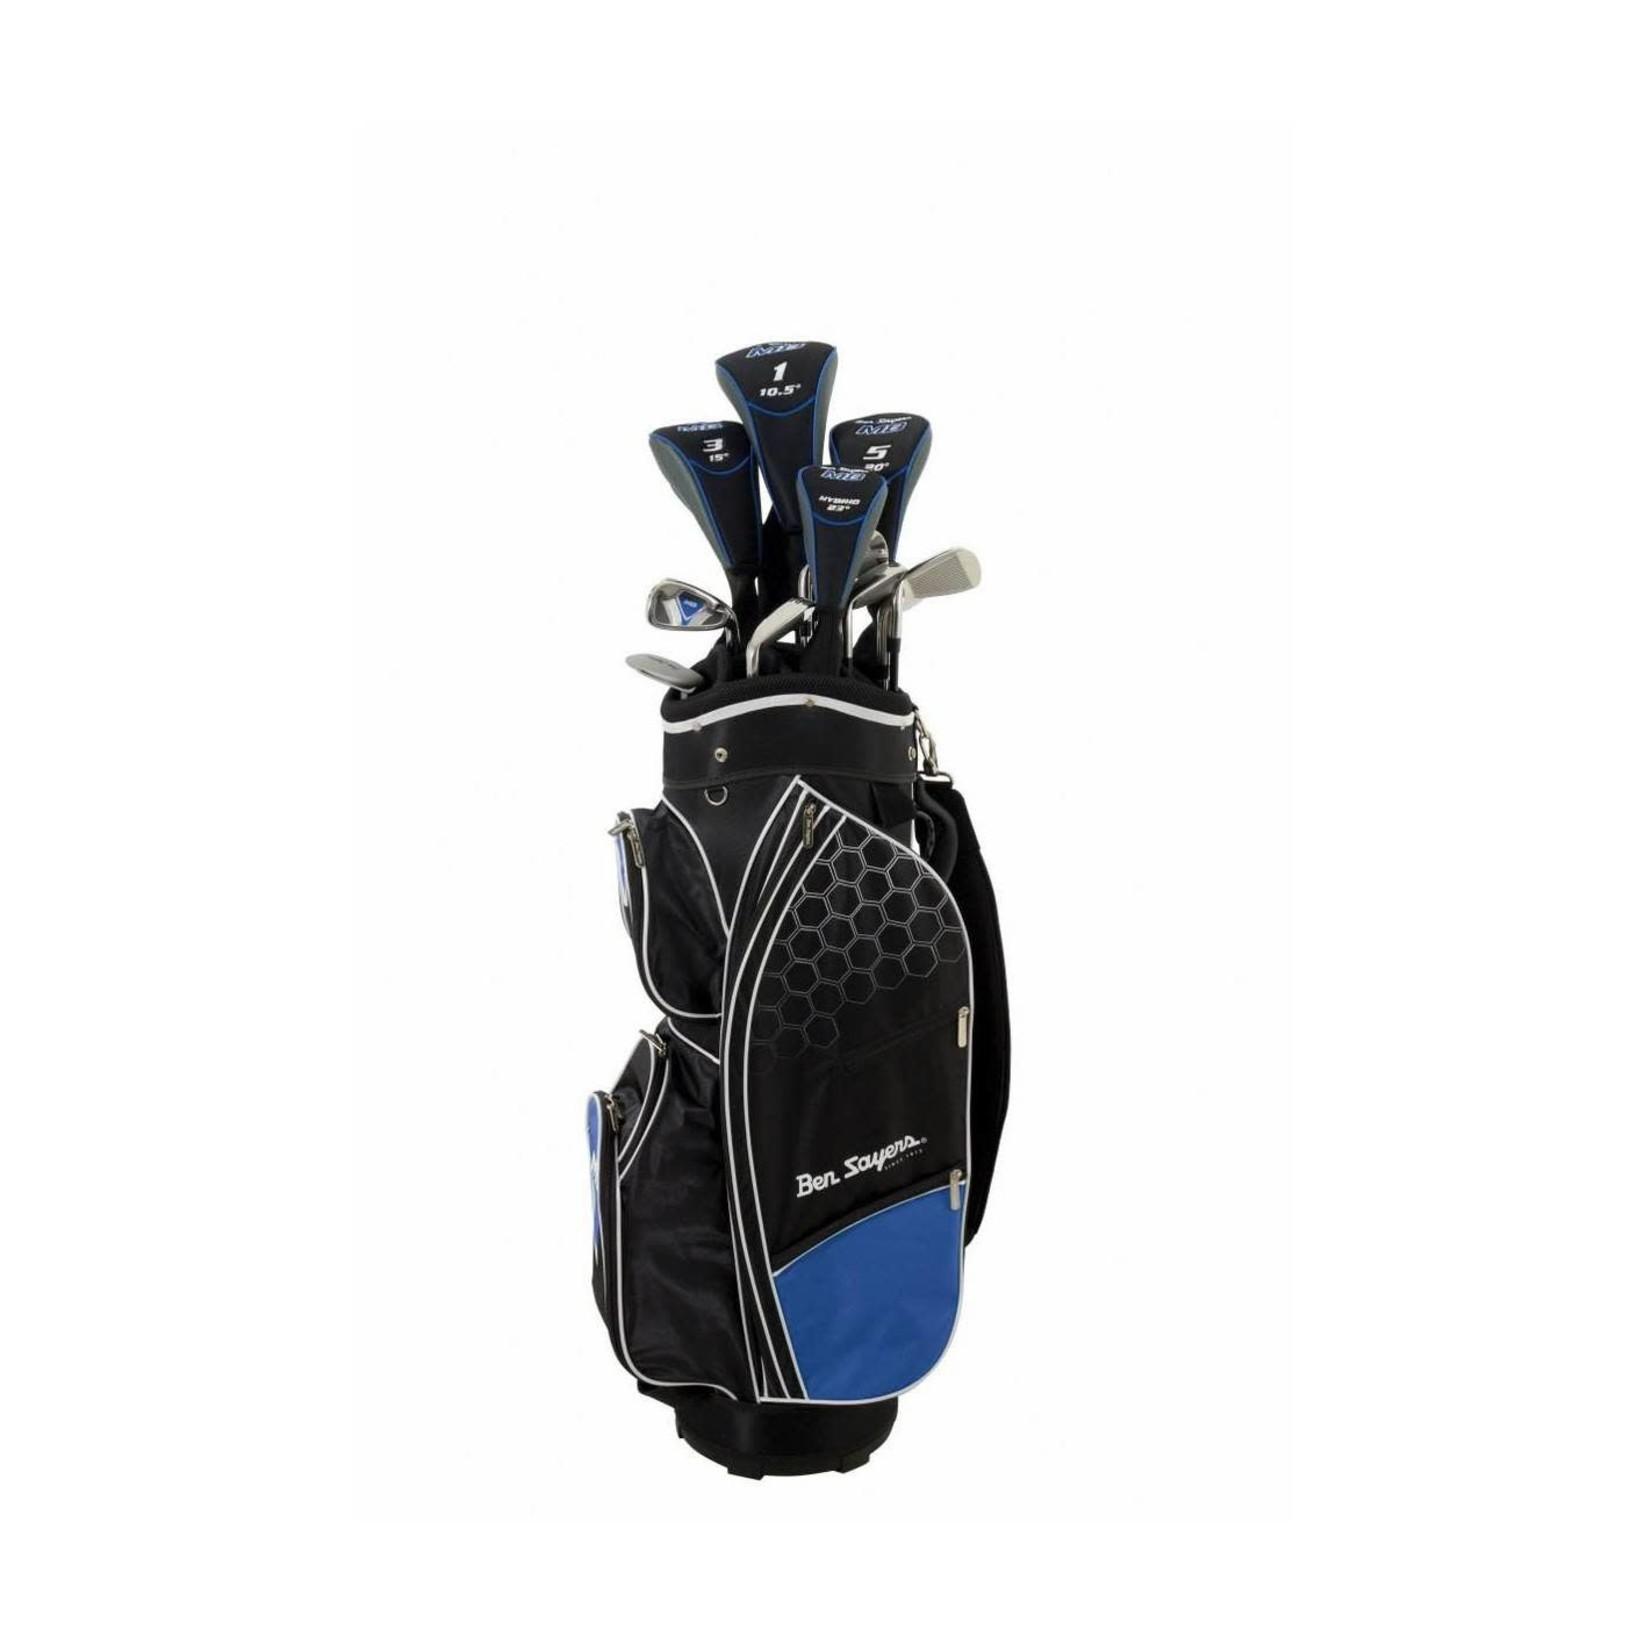 Ben Sayers Ben Sayers M8 complete set Black/Blue Cartbag Heren RH graphite